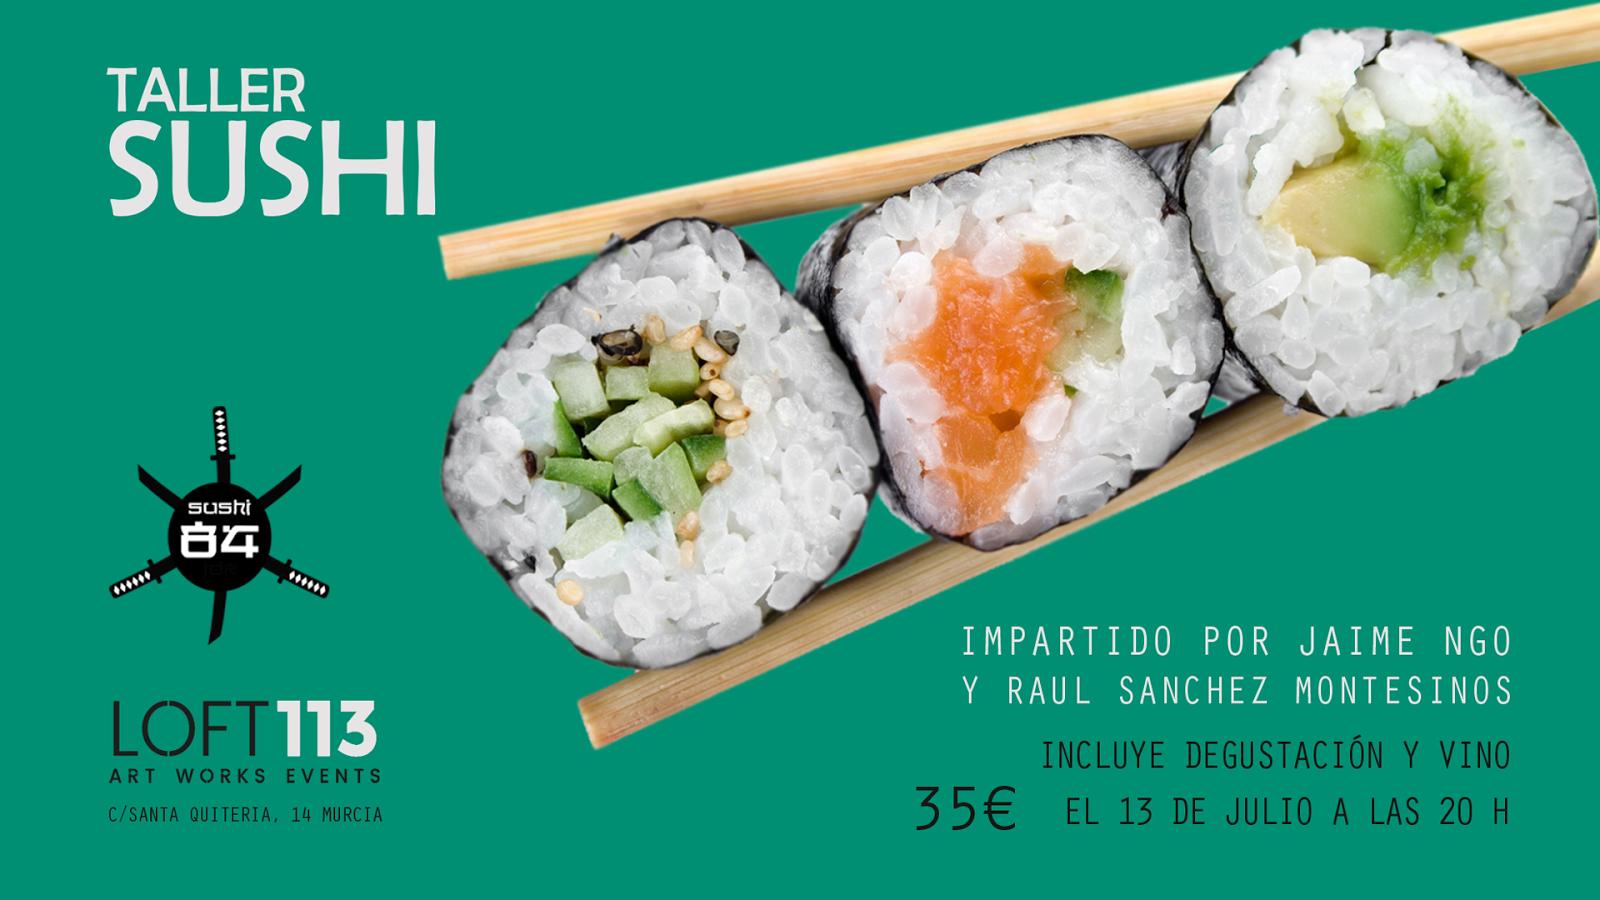 Taller de sushi en Loft 113